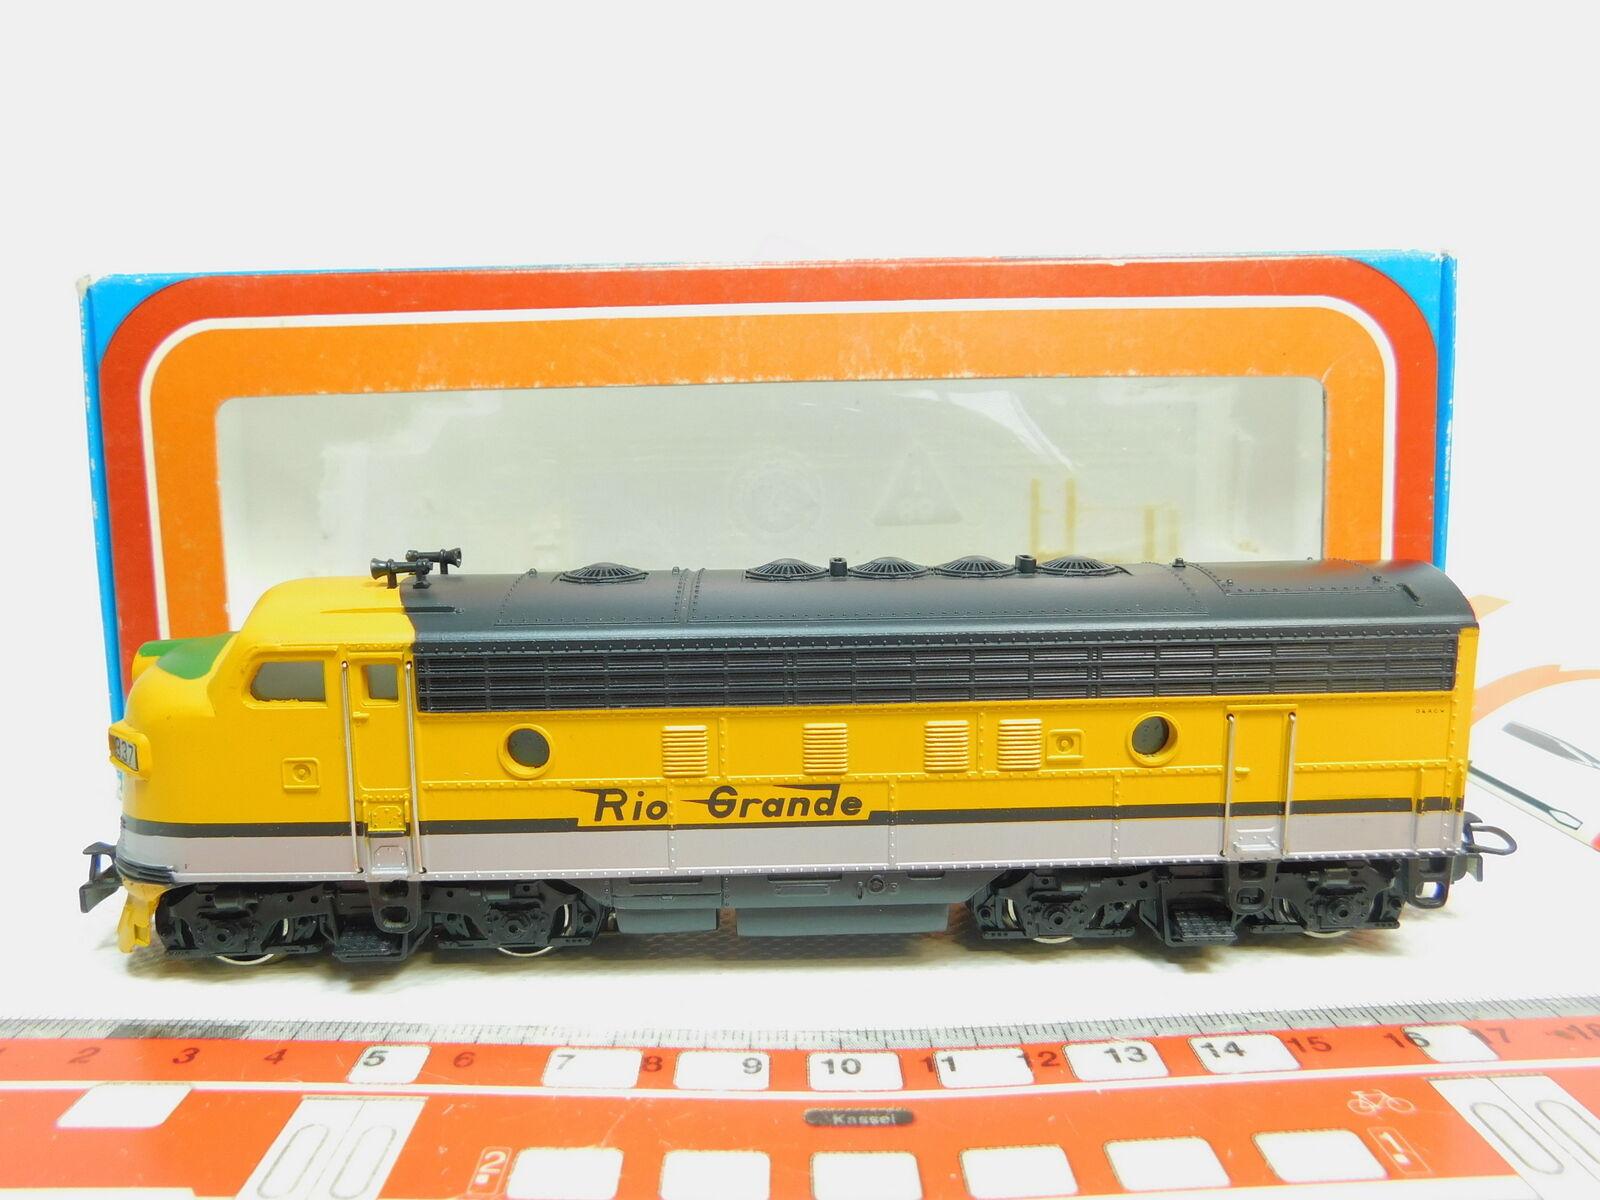 Bo63-1    H0/AC 3062 guss-us Locomotiva diesel-usa diesel-usa diesel-usa F 7 Rio Grande,TOP + be0655